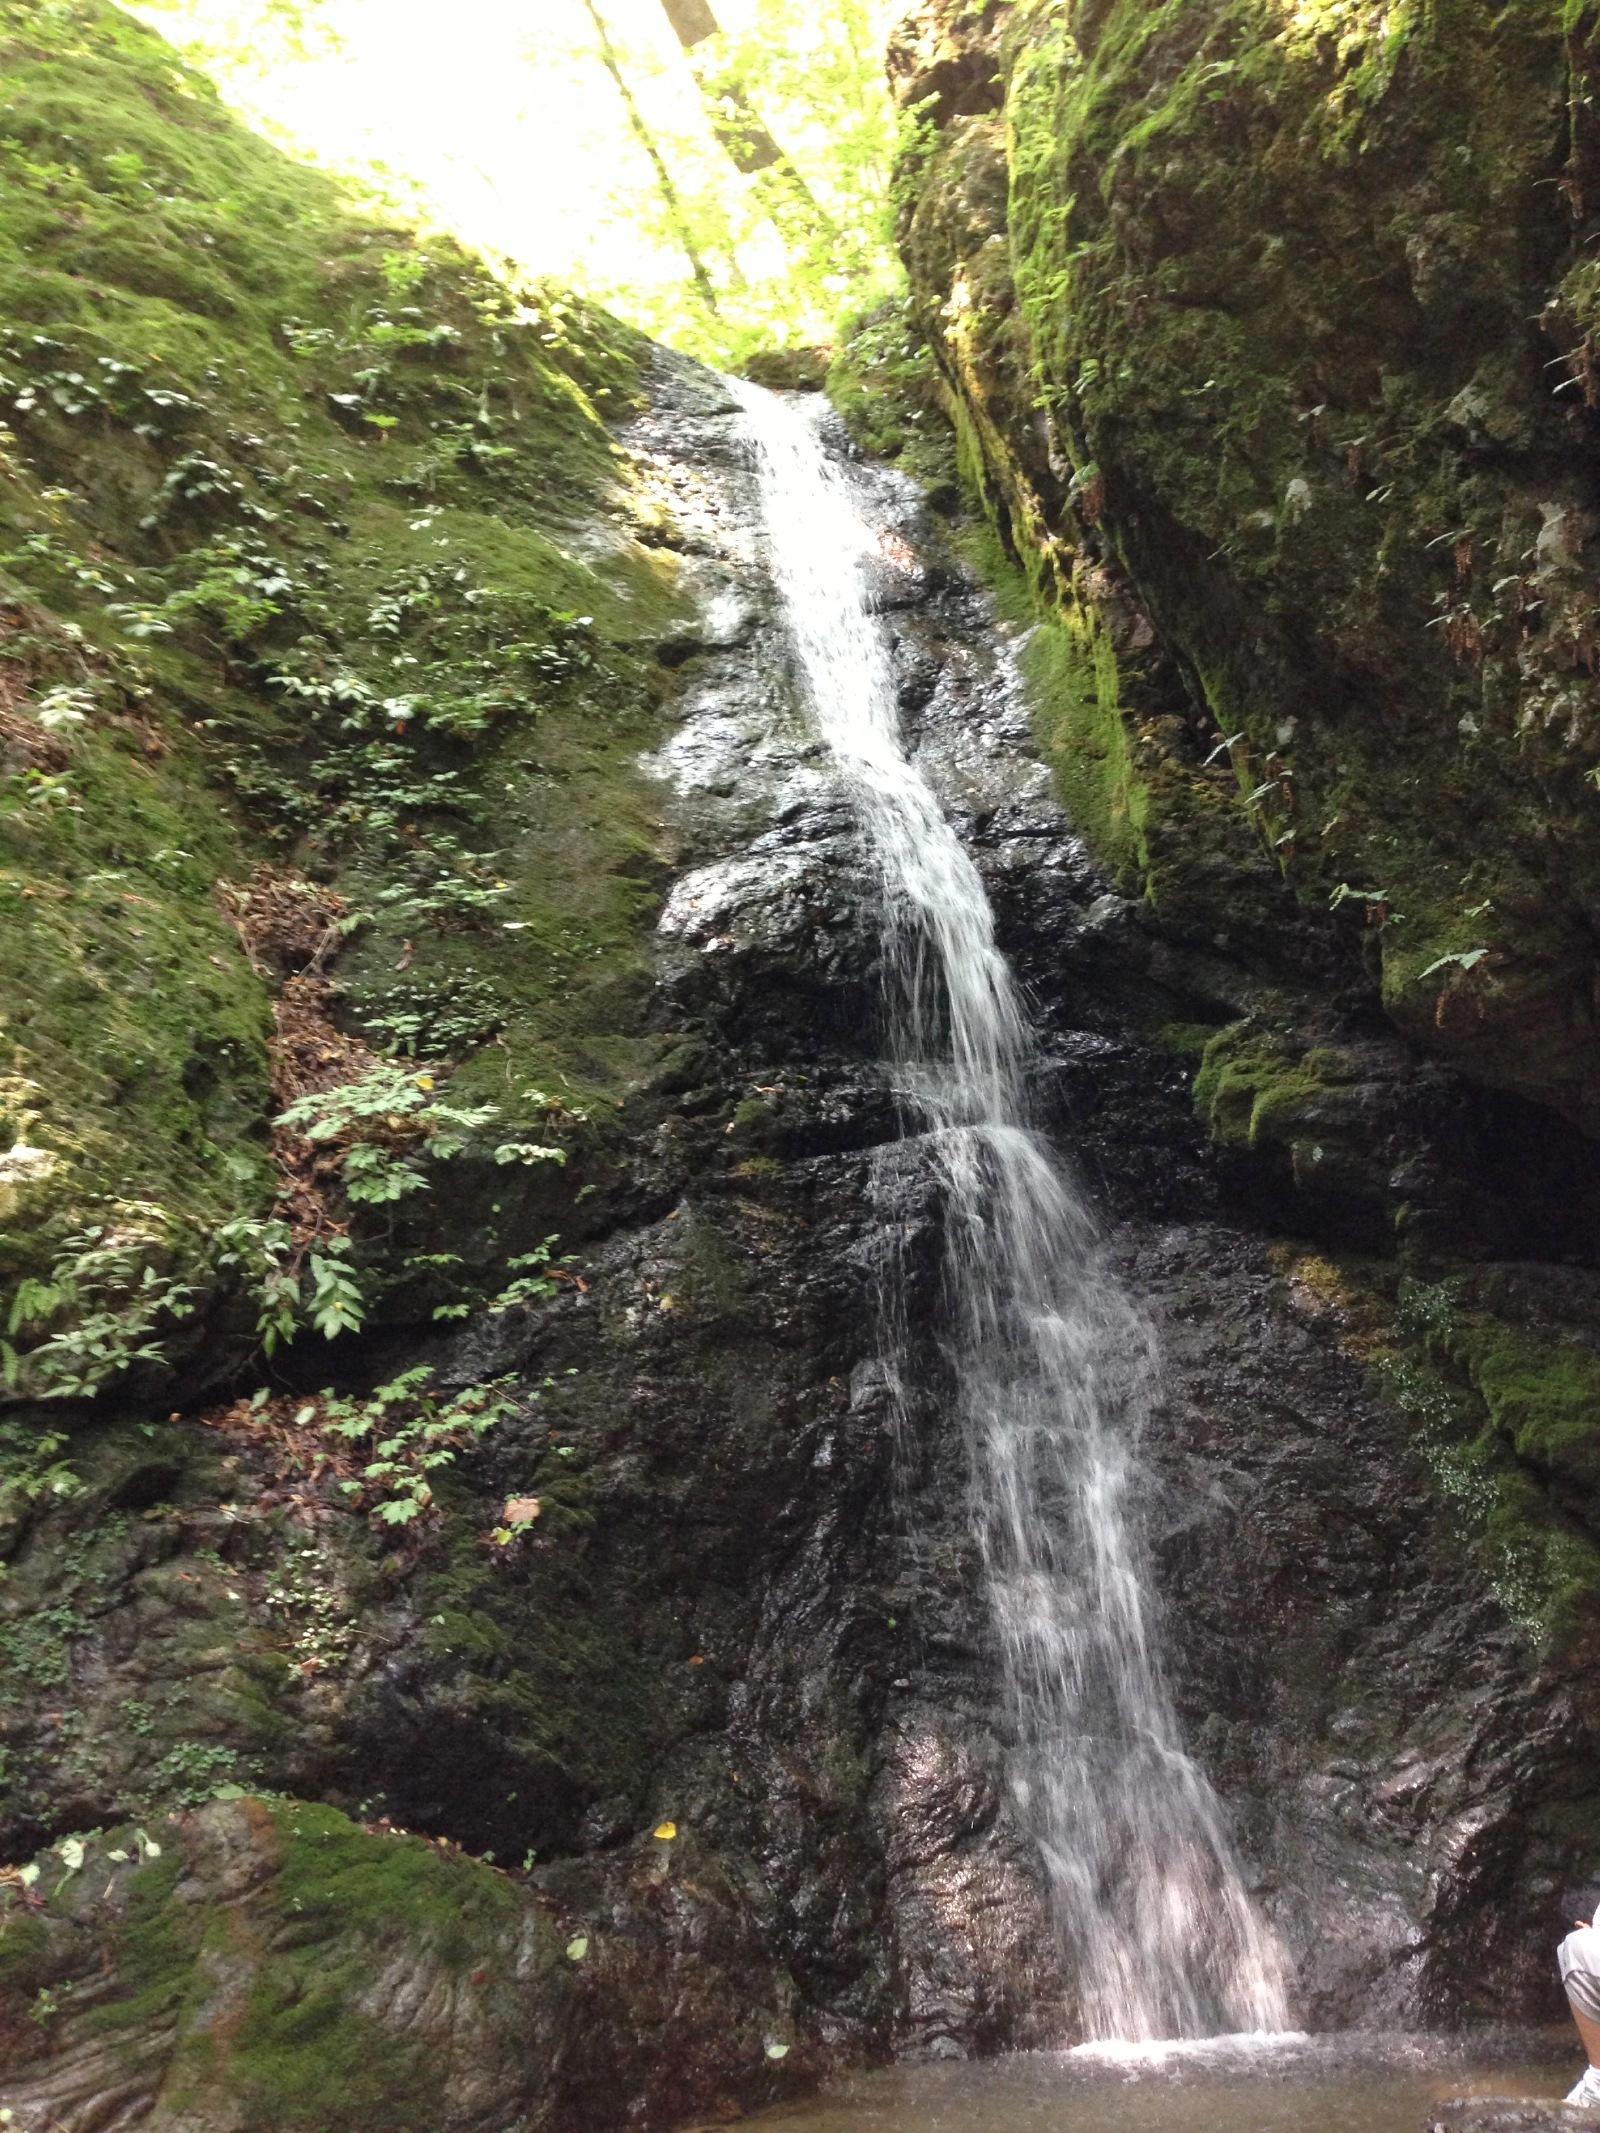 Nanayonotakie water fall